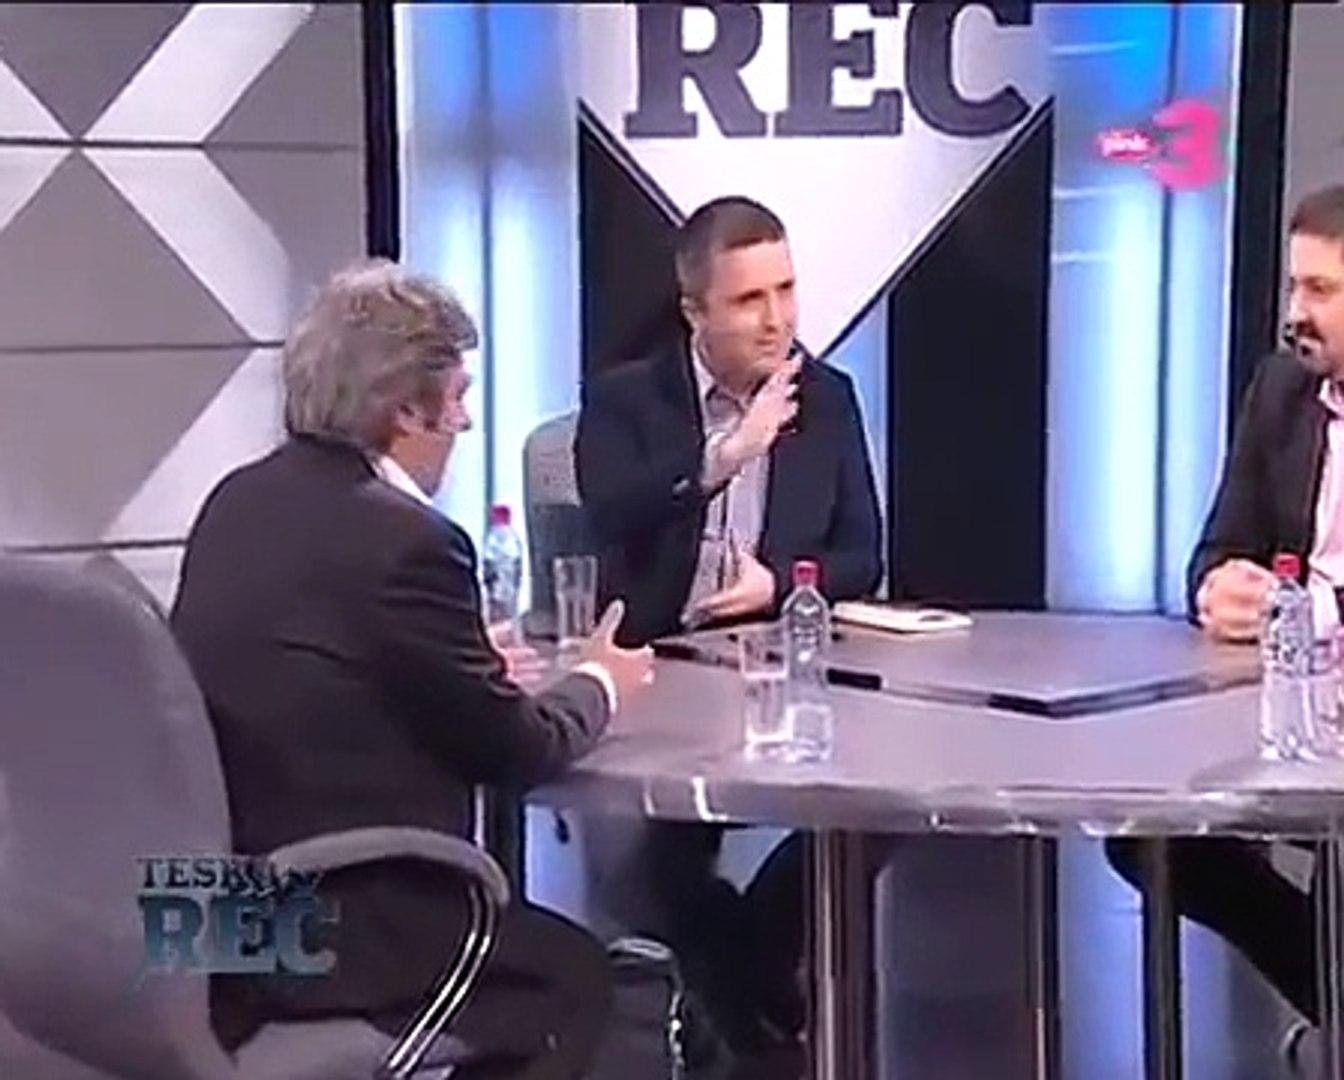 Teška reč - Milomir Marić, Predrag Sarapa i Saša Milovanović